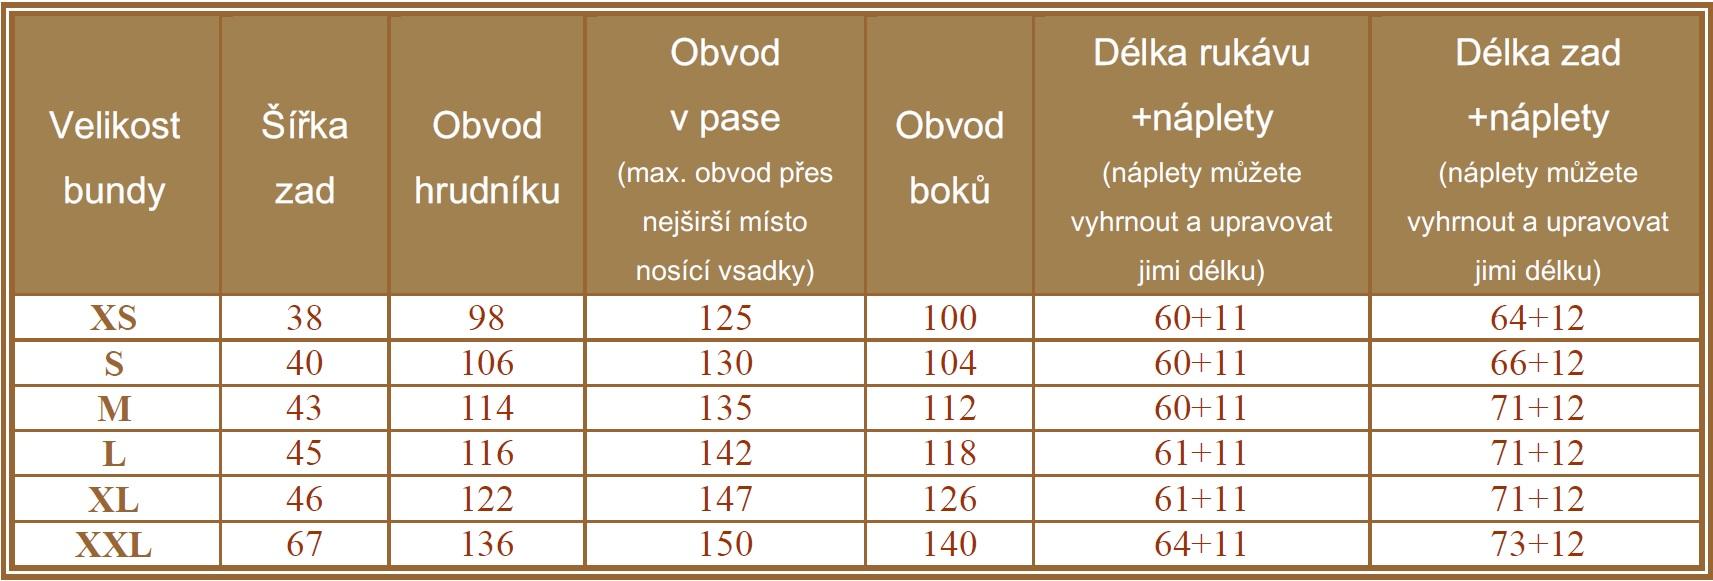 tabulka mír nosících bund_final